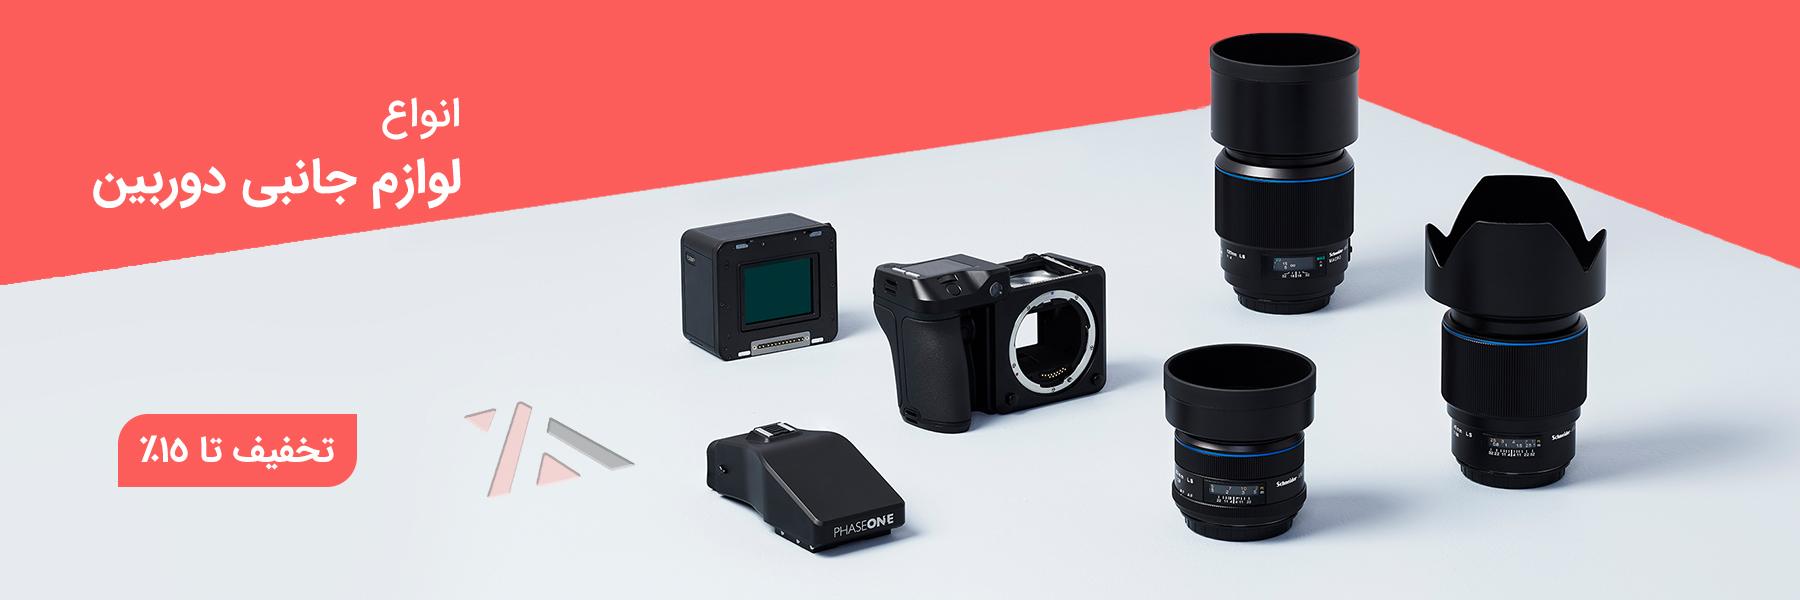 لوازم  جانبی دوربین عکاسی، لنز دوربین فیلمبرداری، خرید آنلاین، فروشگاه اینترنتی آف تپ